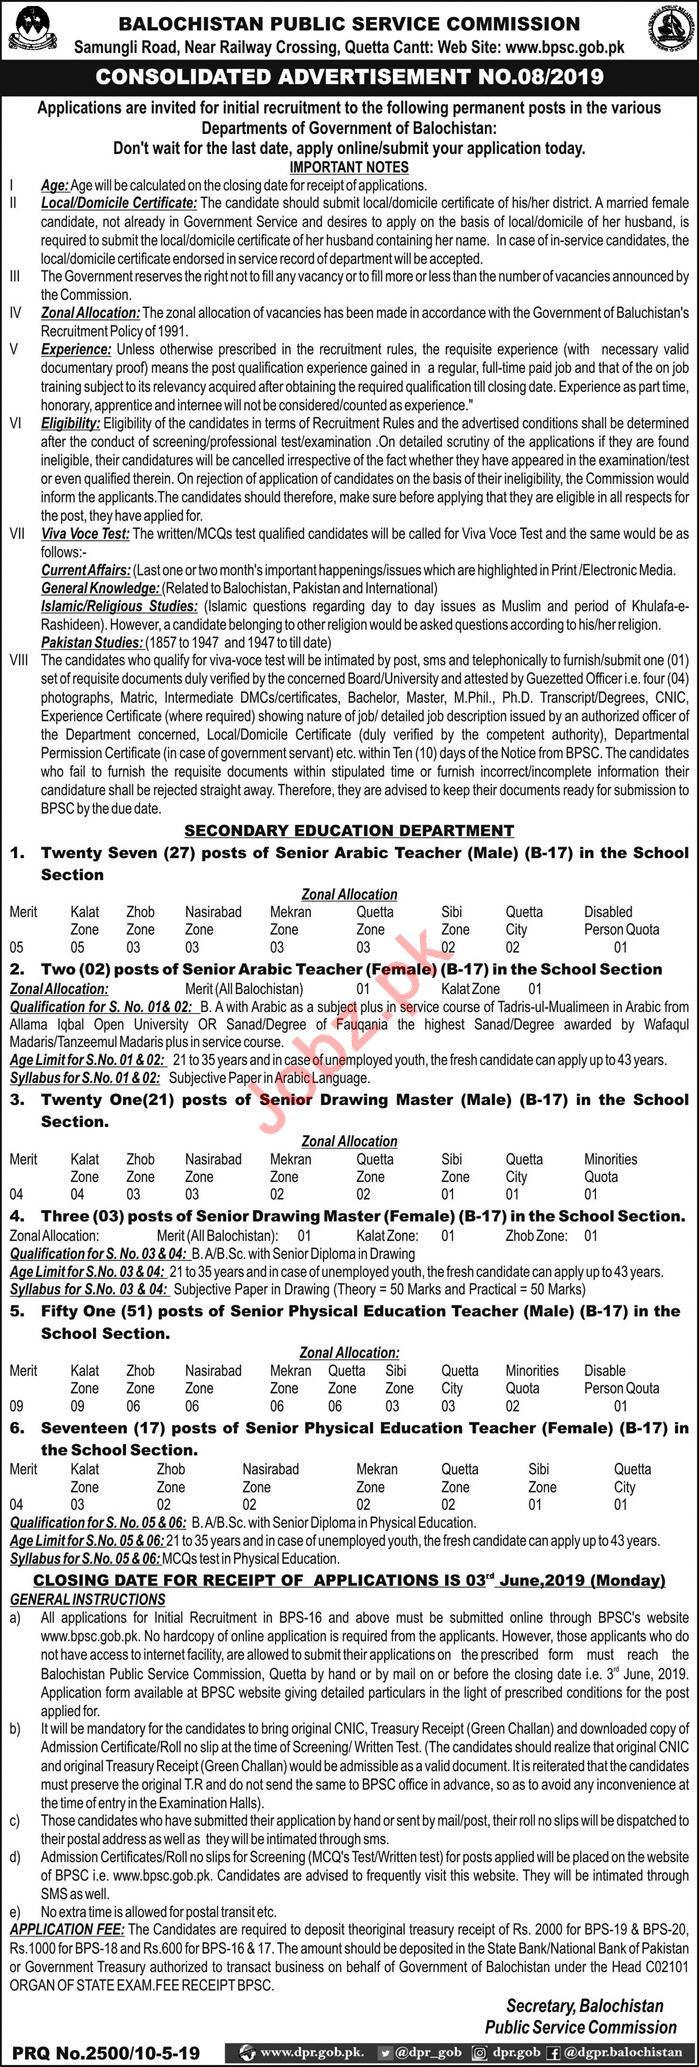 Secondary Education Department Jobs 2019 via BPSC